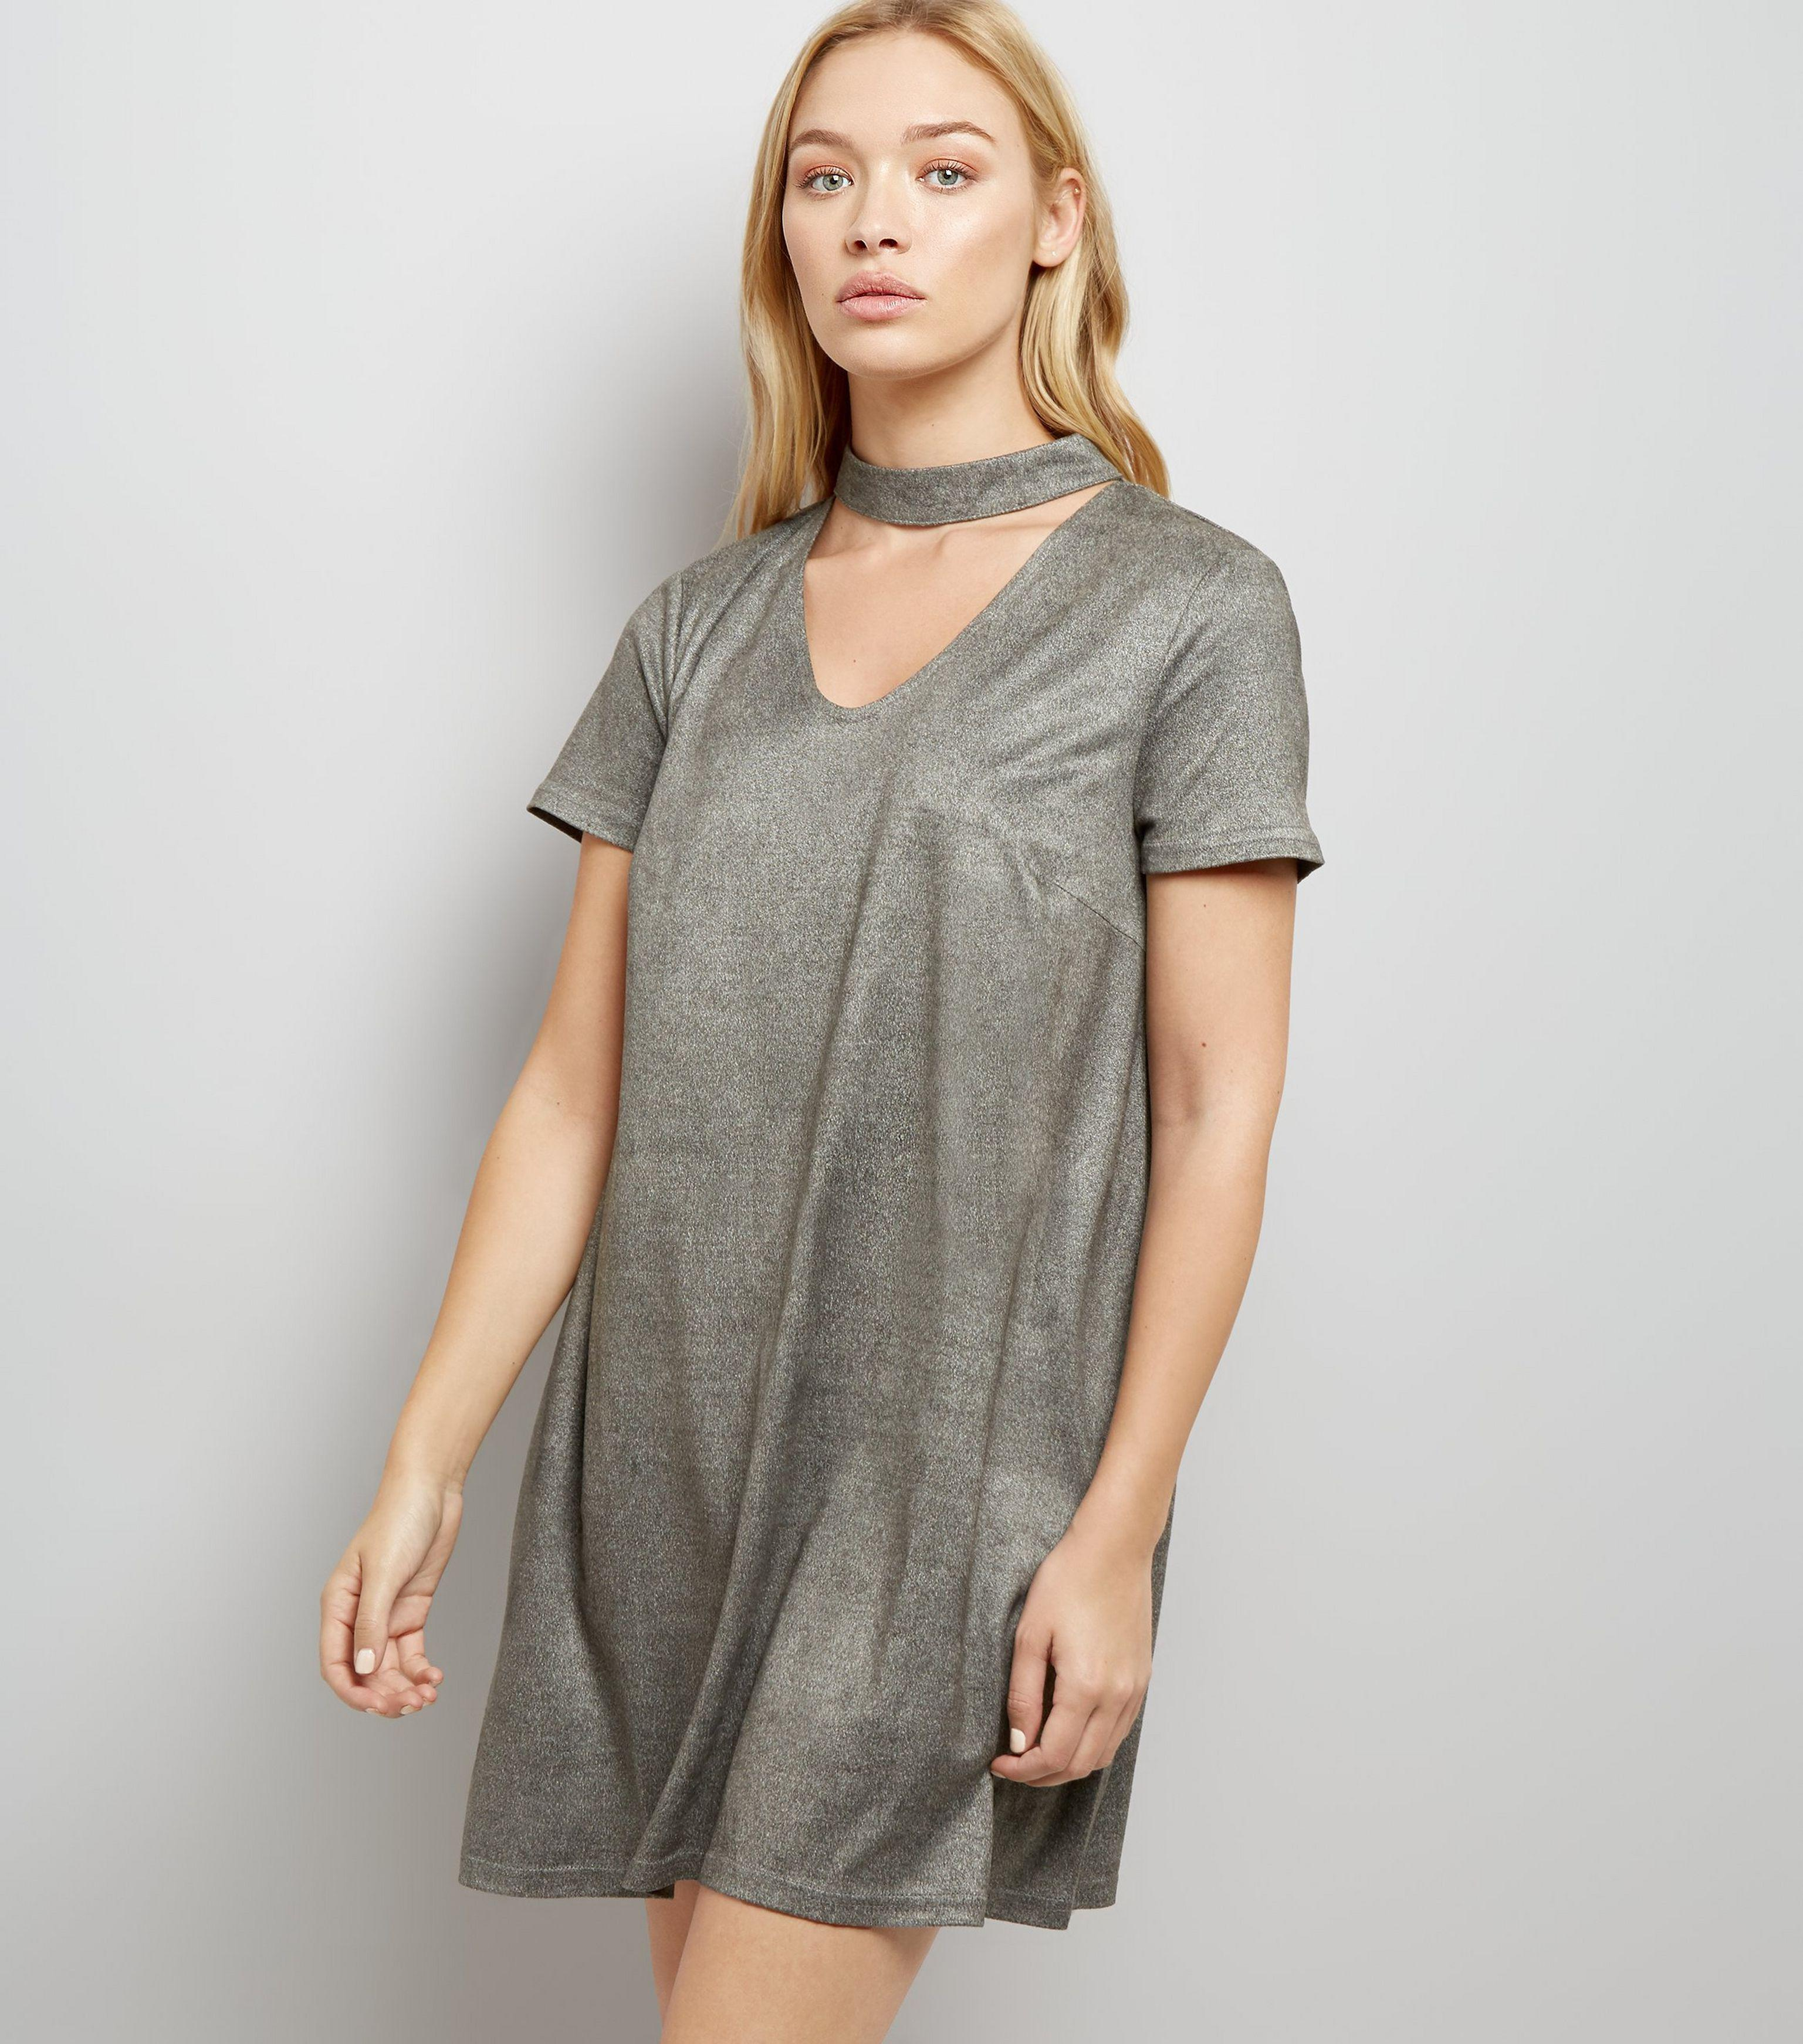 0cb7afc7542af New look grey suedette choker neck dress in gray lyst jpg 3073x3484 Grey  choker neckline dress